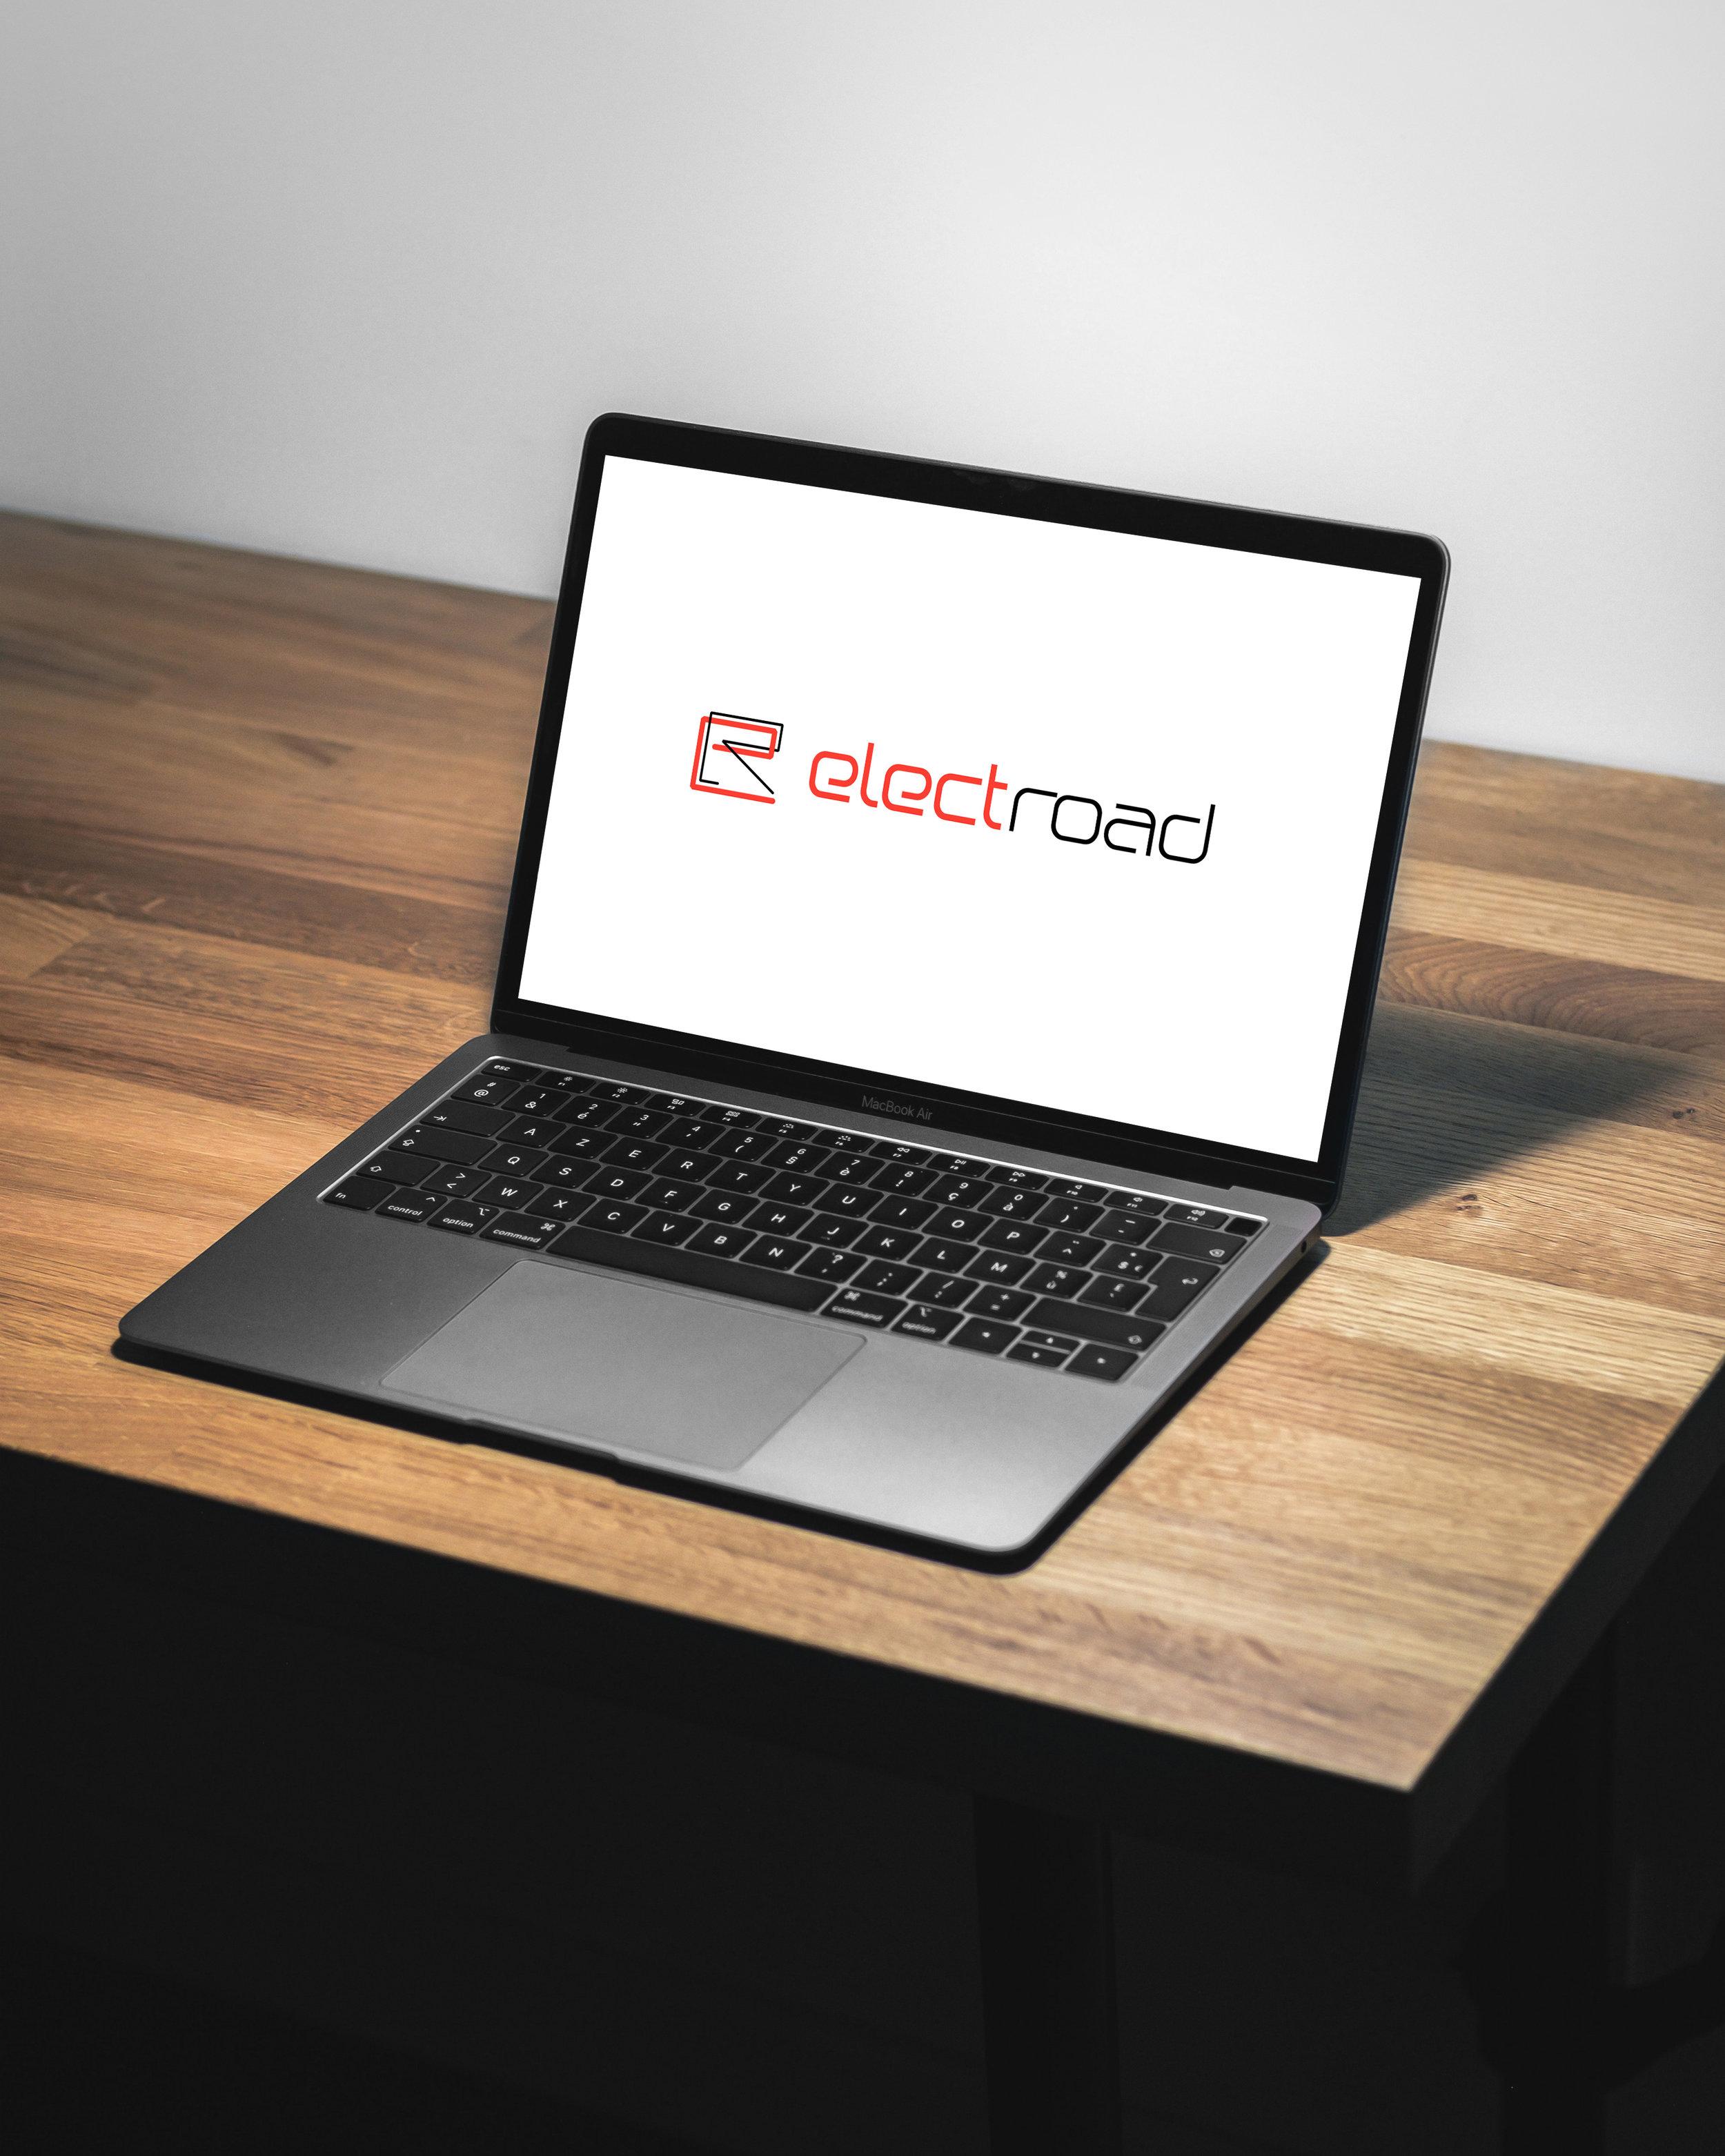 electroad_laptop.jpg